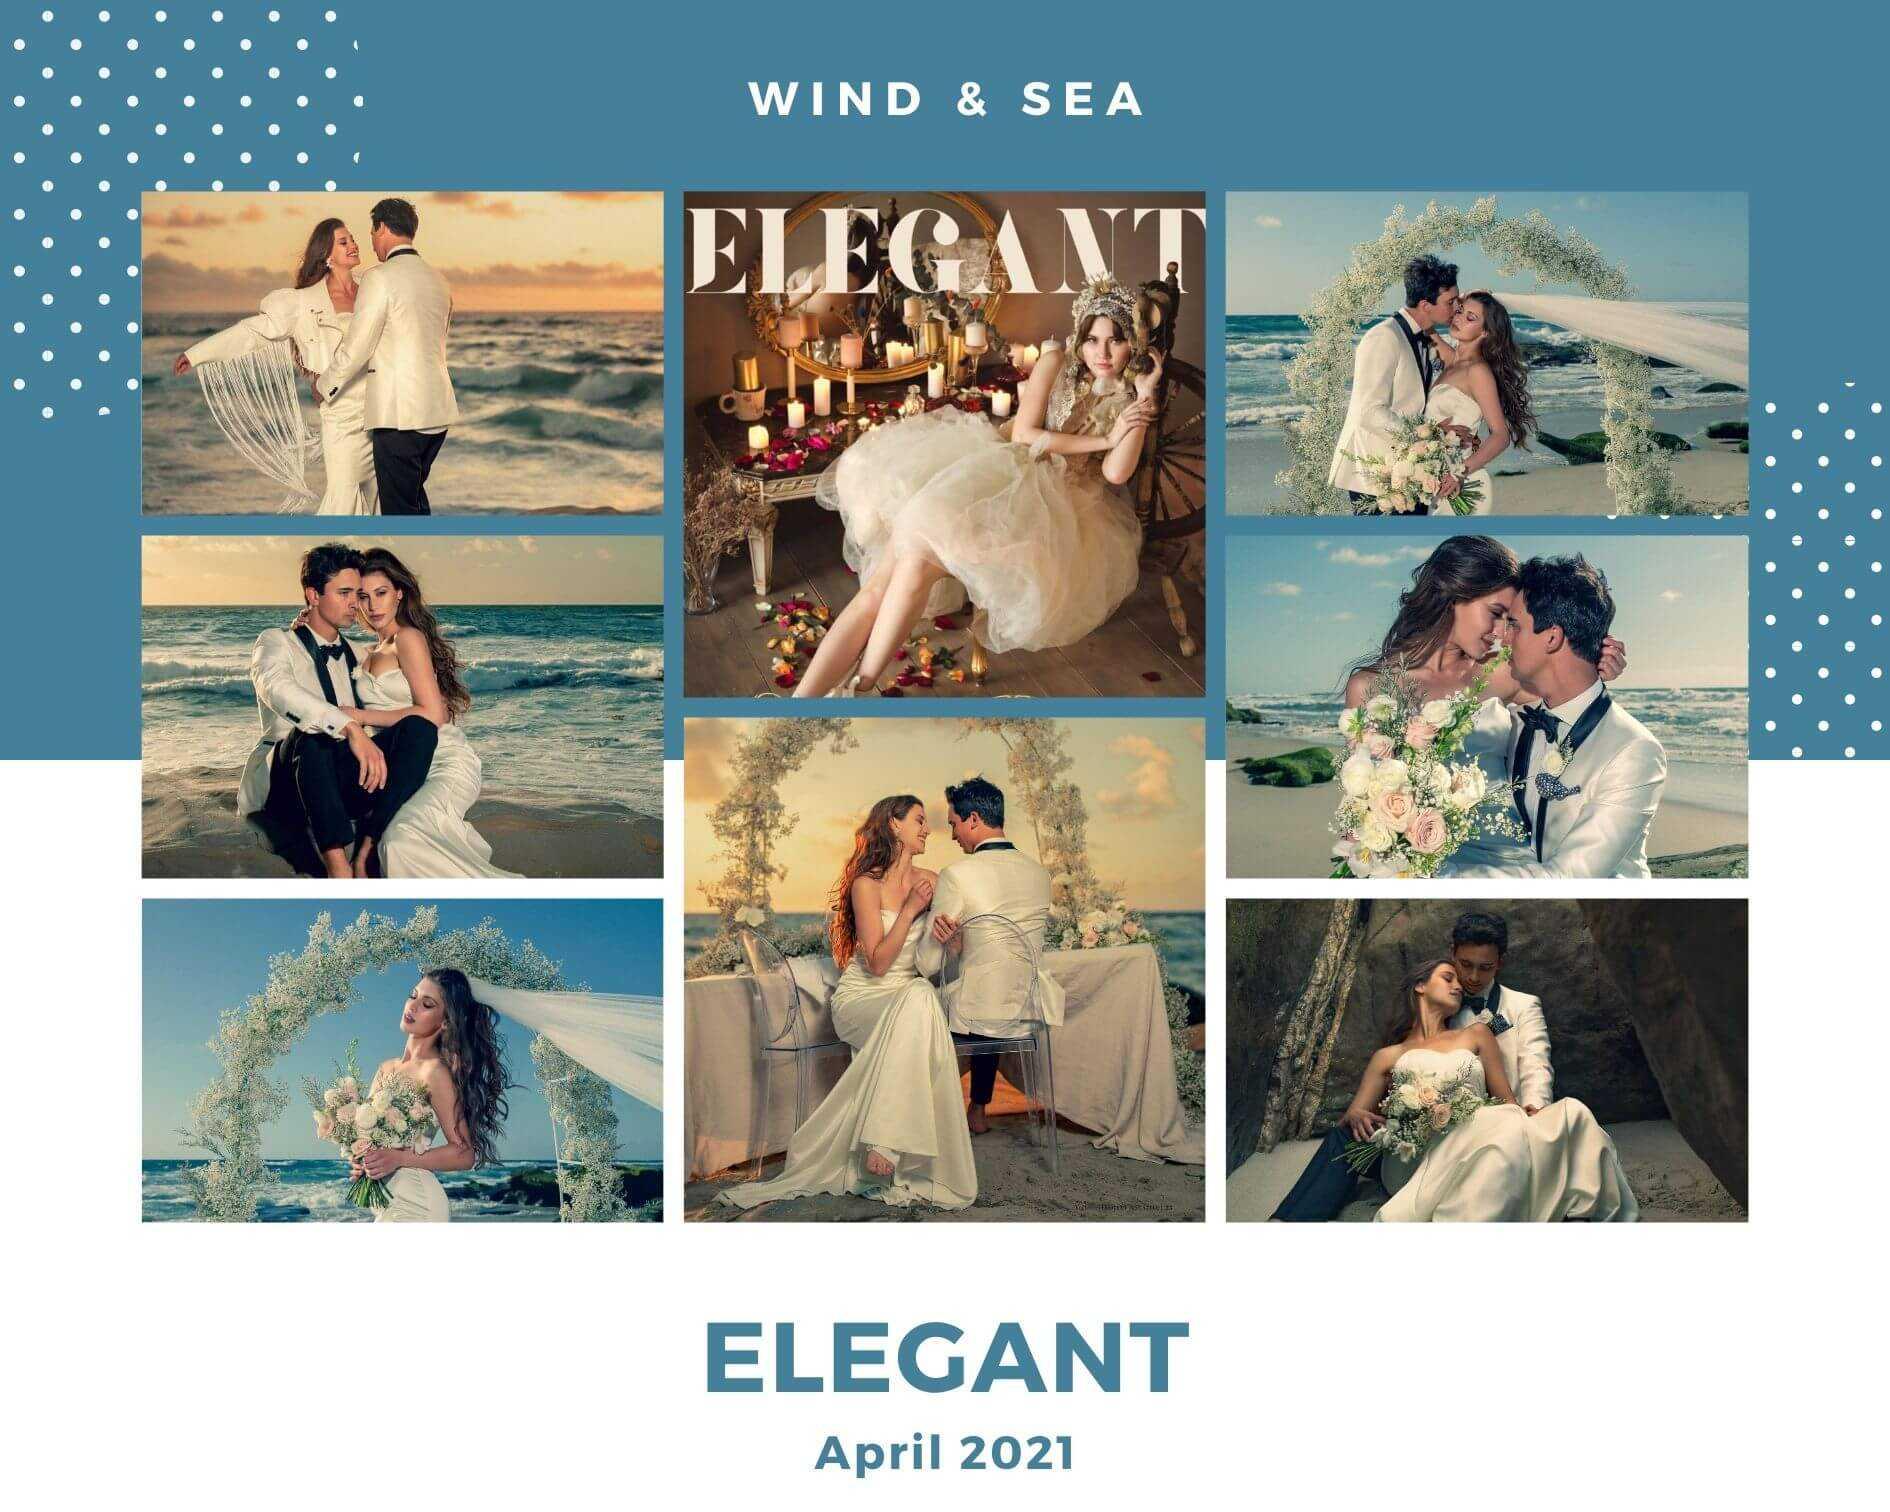 Elegant April 2021